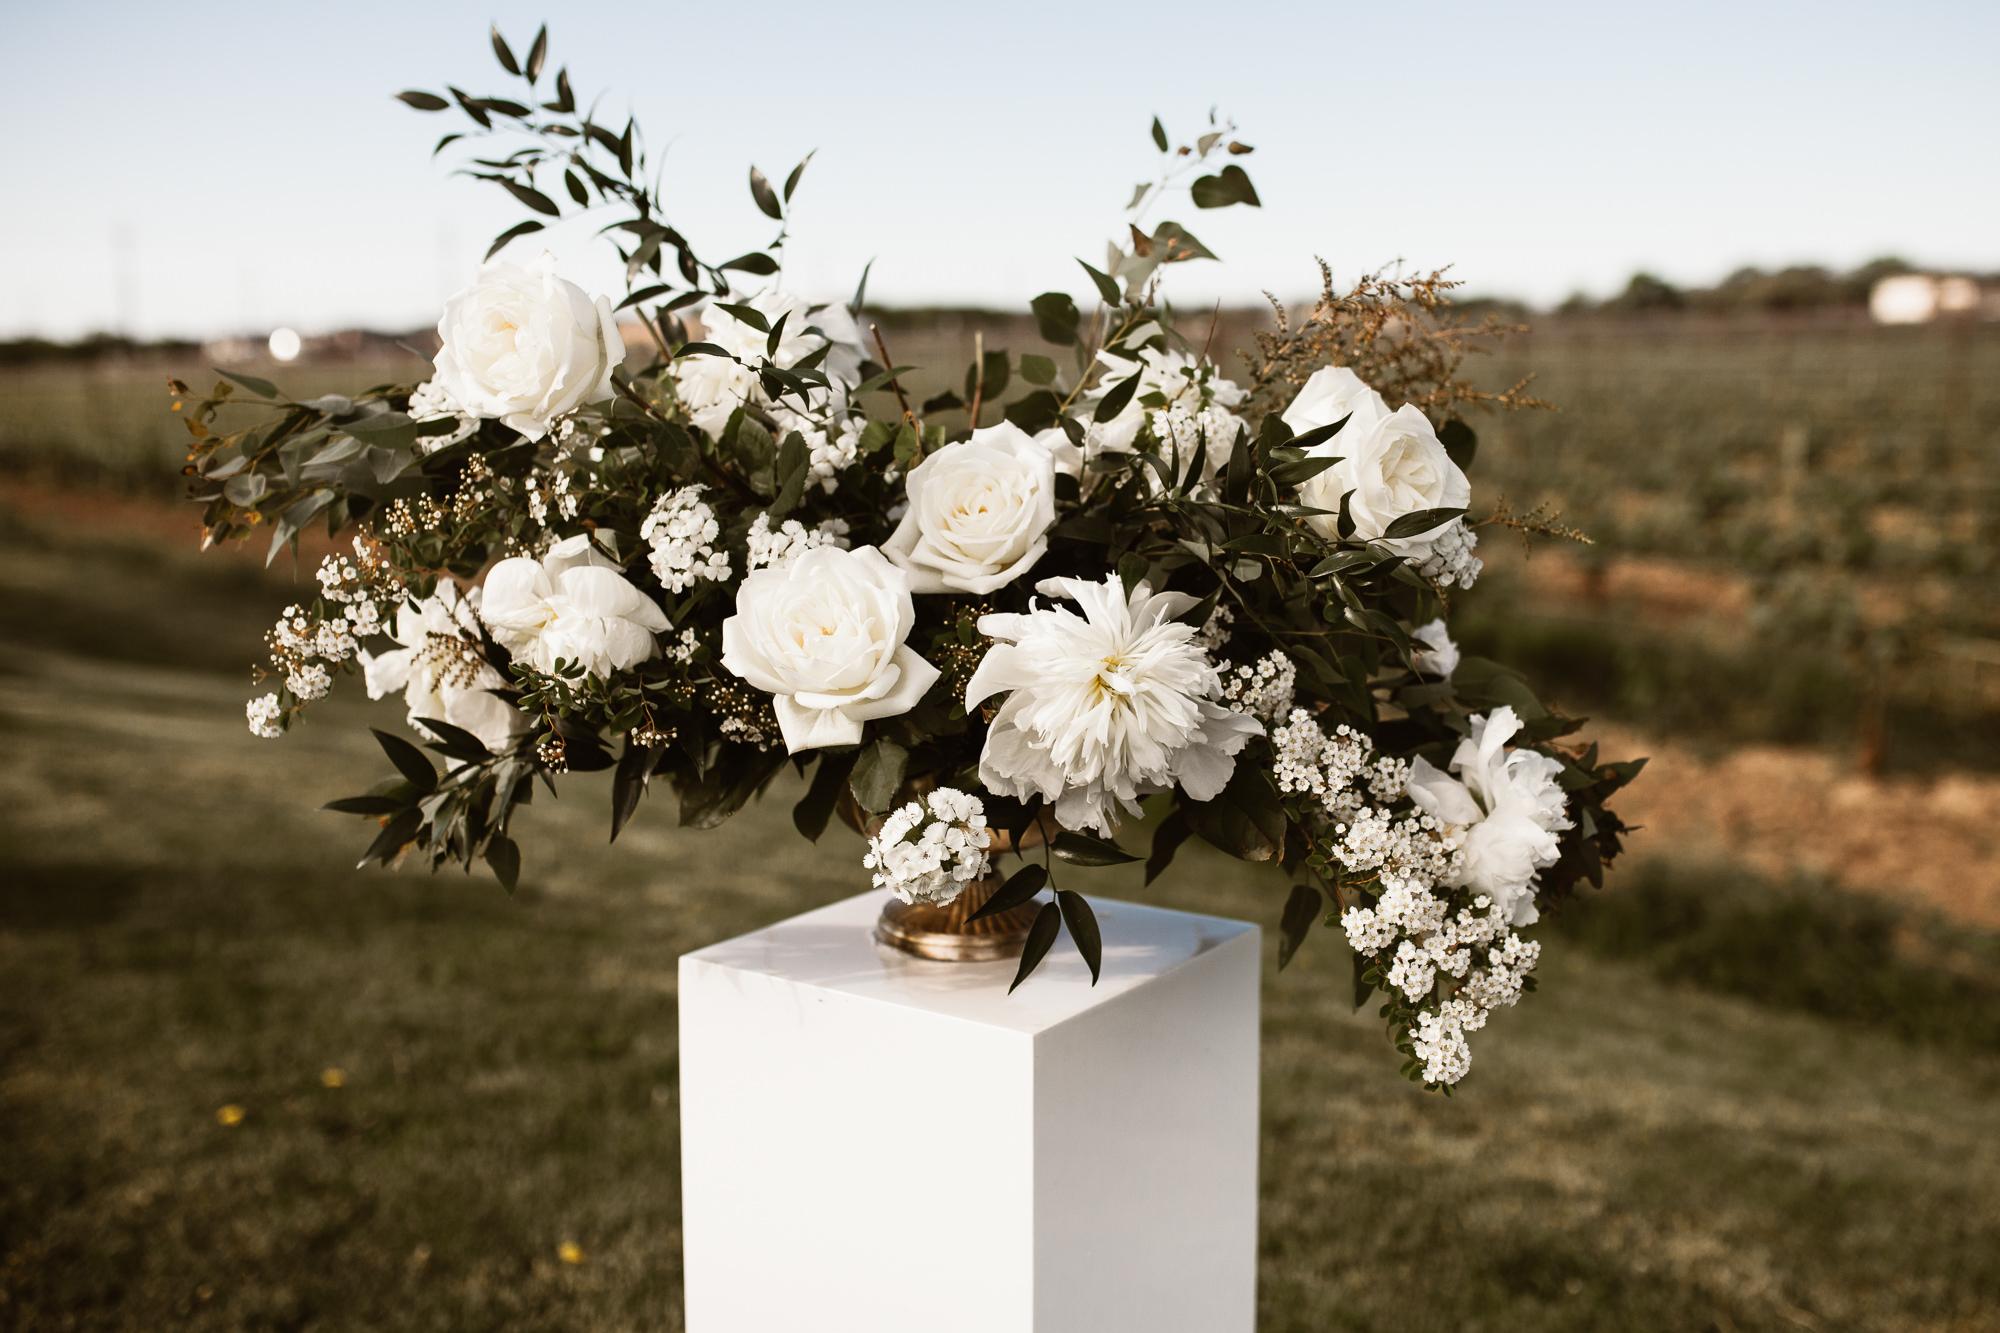 stratus-winery-wedding-vineyard-wedding-vineyard-bride-photo-by-reed-photography-034.jpg